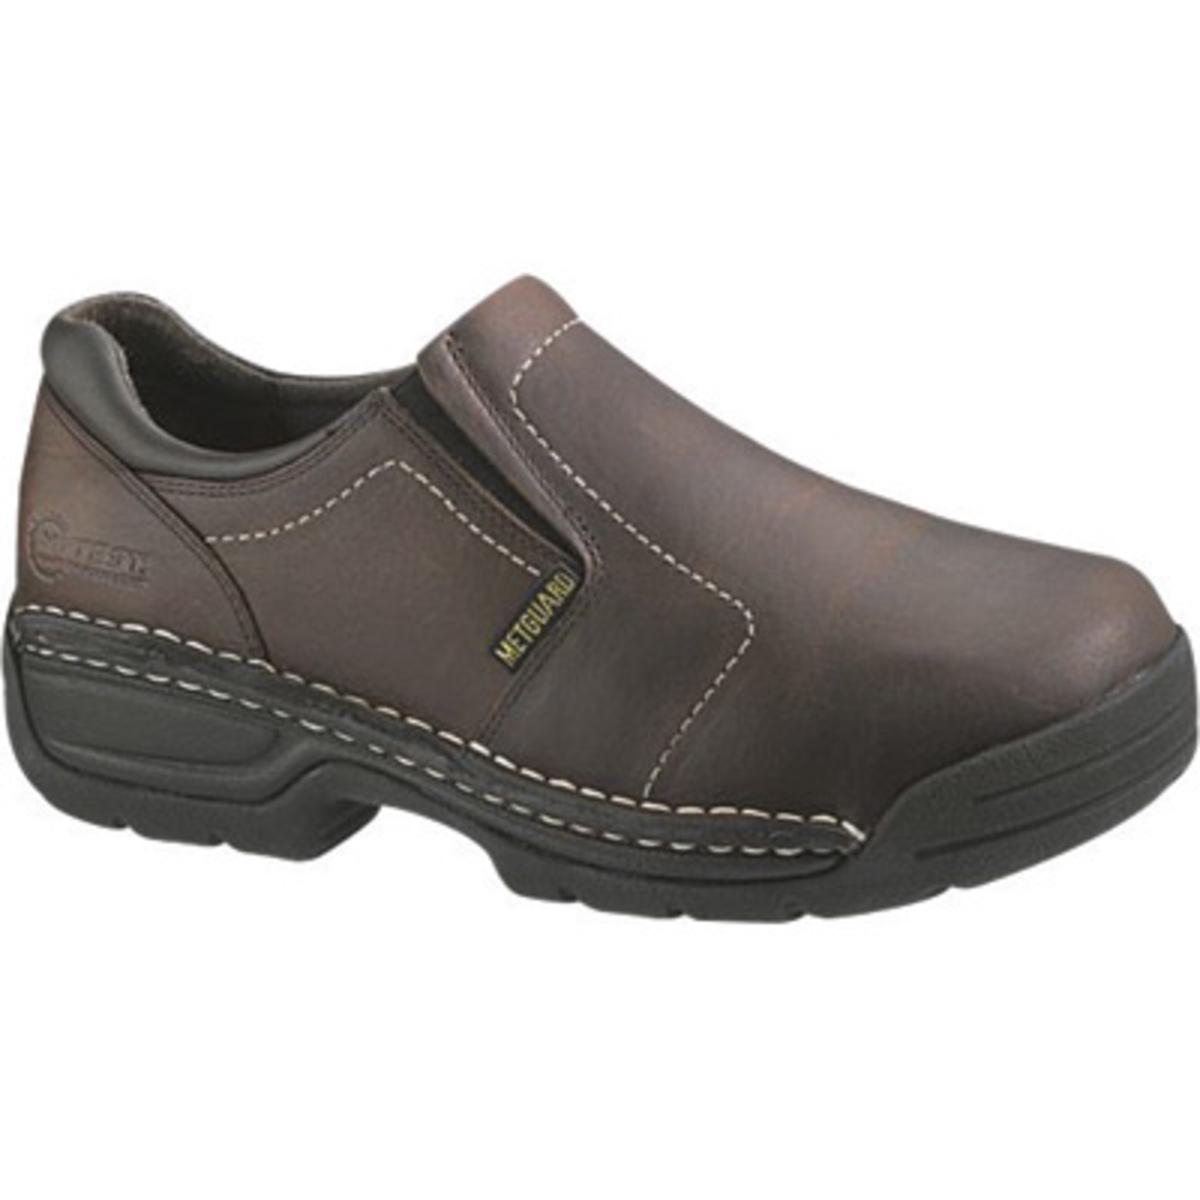 Airgas - HY110241-11W - Hytestu00ae 11-W Brown Grain Leather Opanka Slip-On Menu0026#39;s Womenu0026#39;s Safety ...